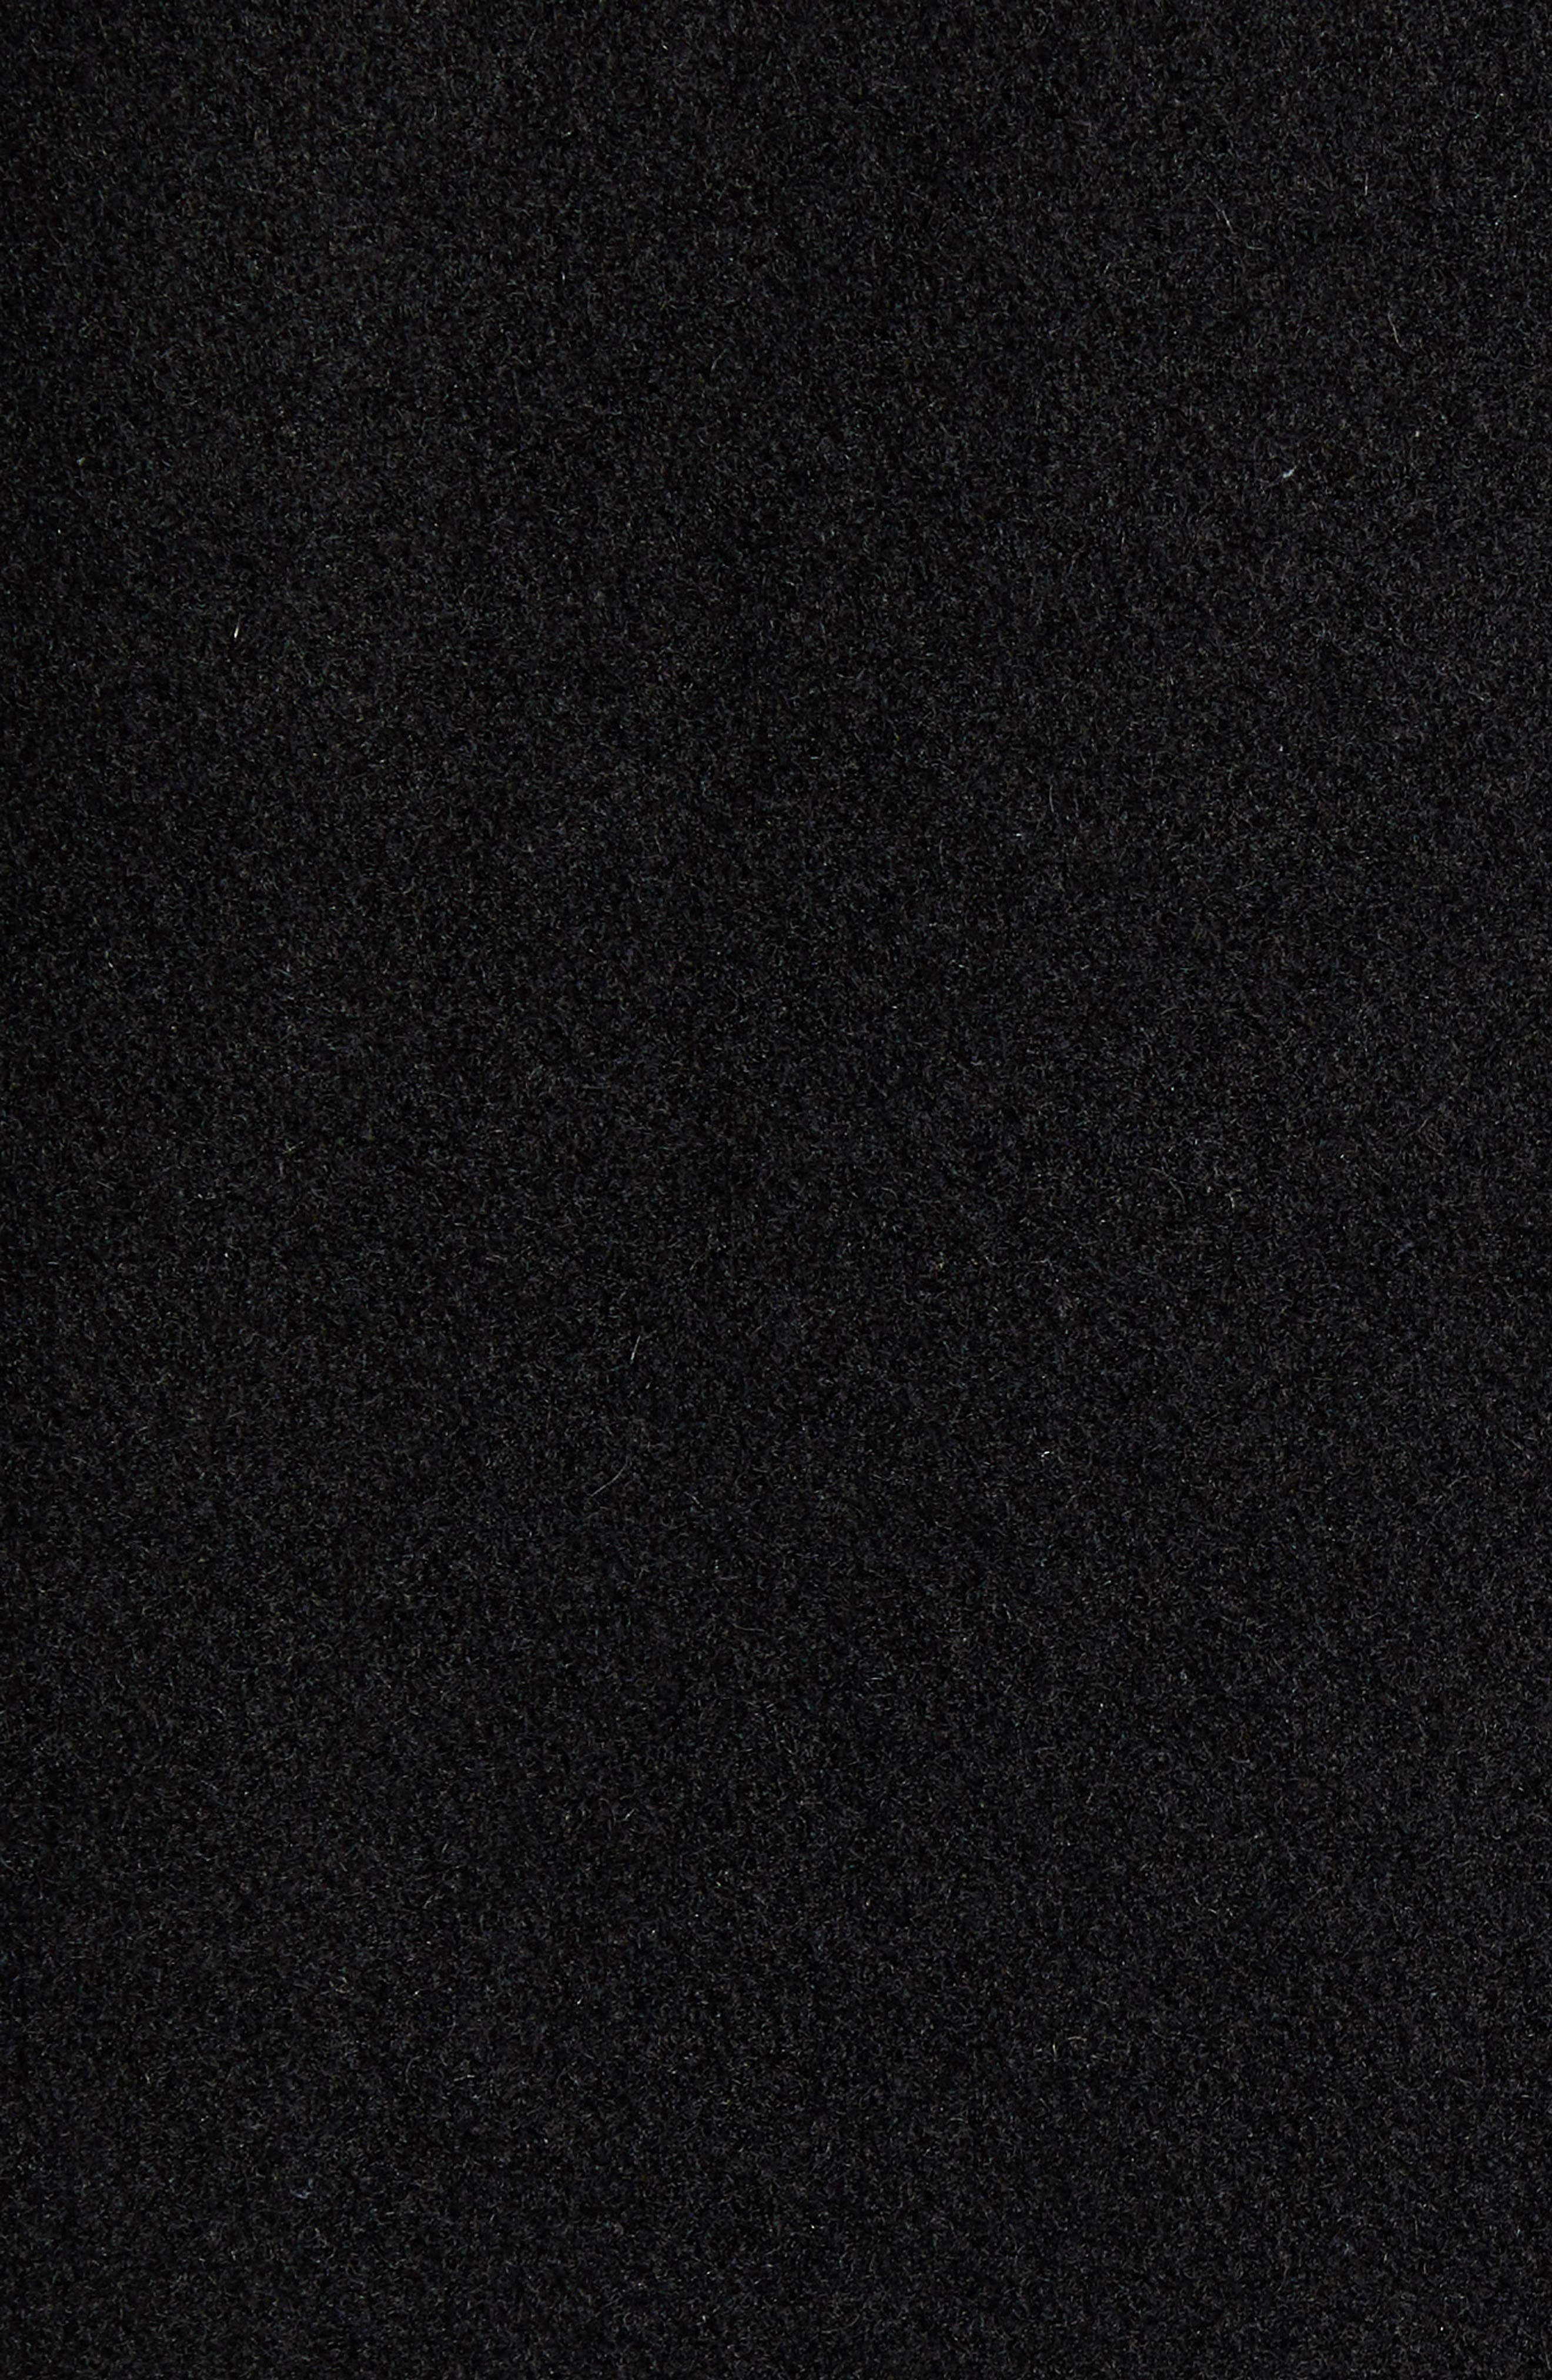 Layered Wool Blend Coat,                             Alternate thumbnail 7, color,                             BLACK